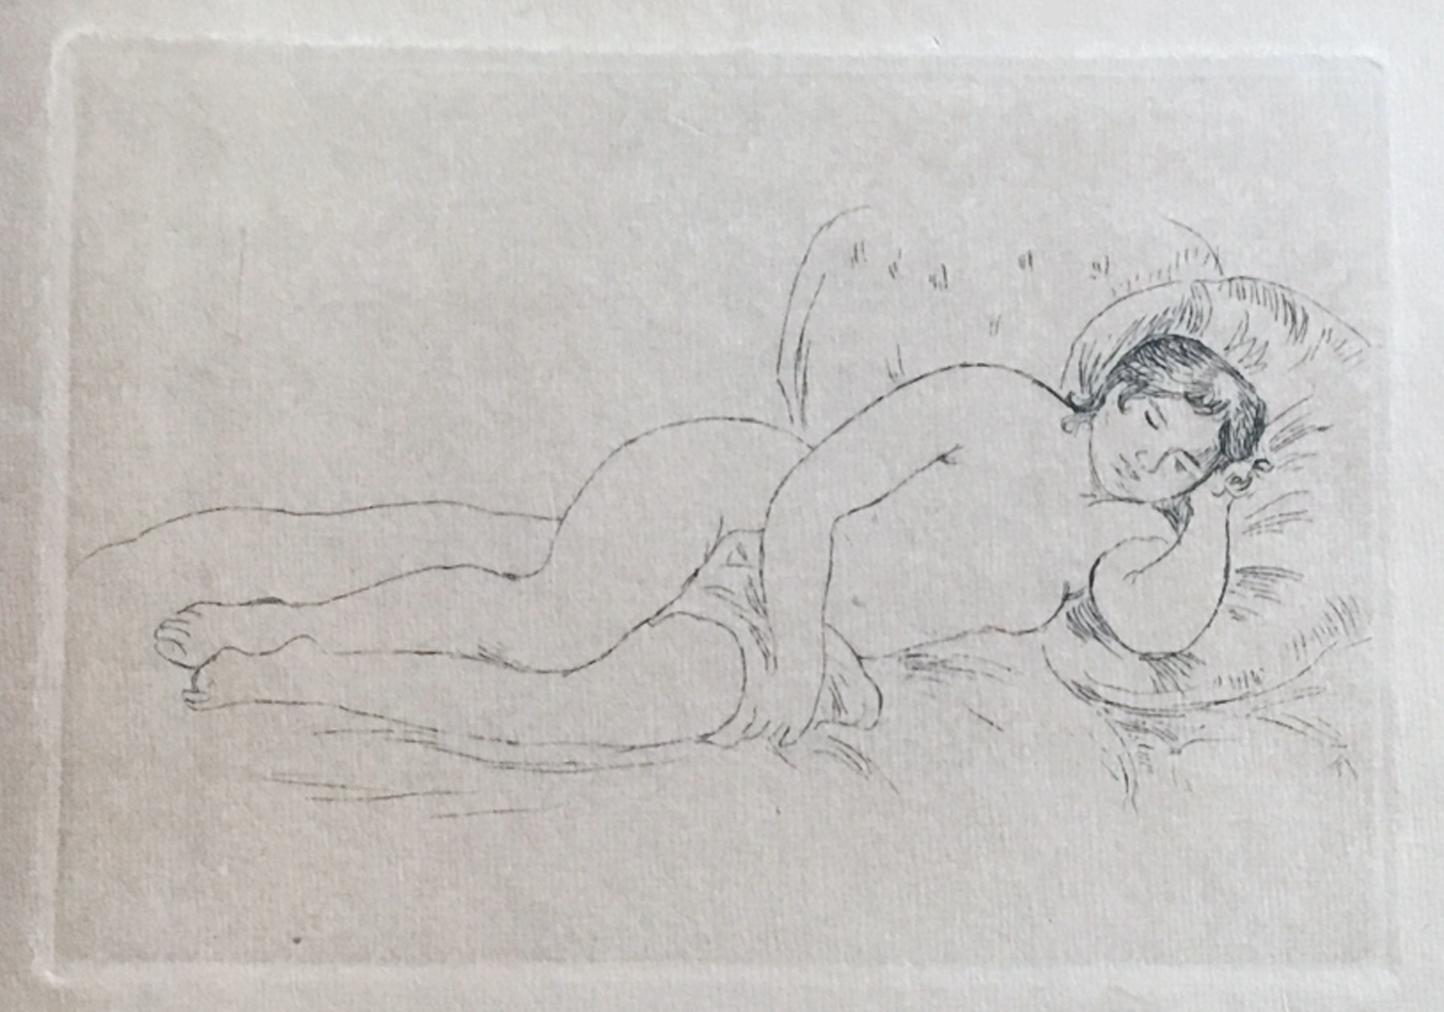 Renoir peintre du nu. With an original etching. Pierre-Auguste Renoir Very Good Softcover